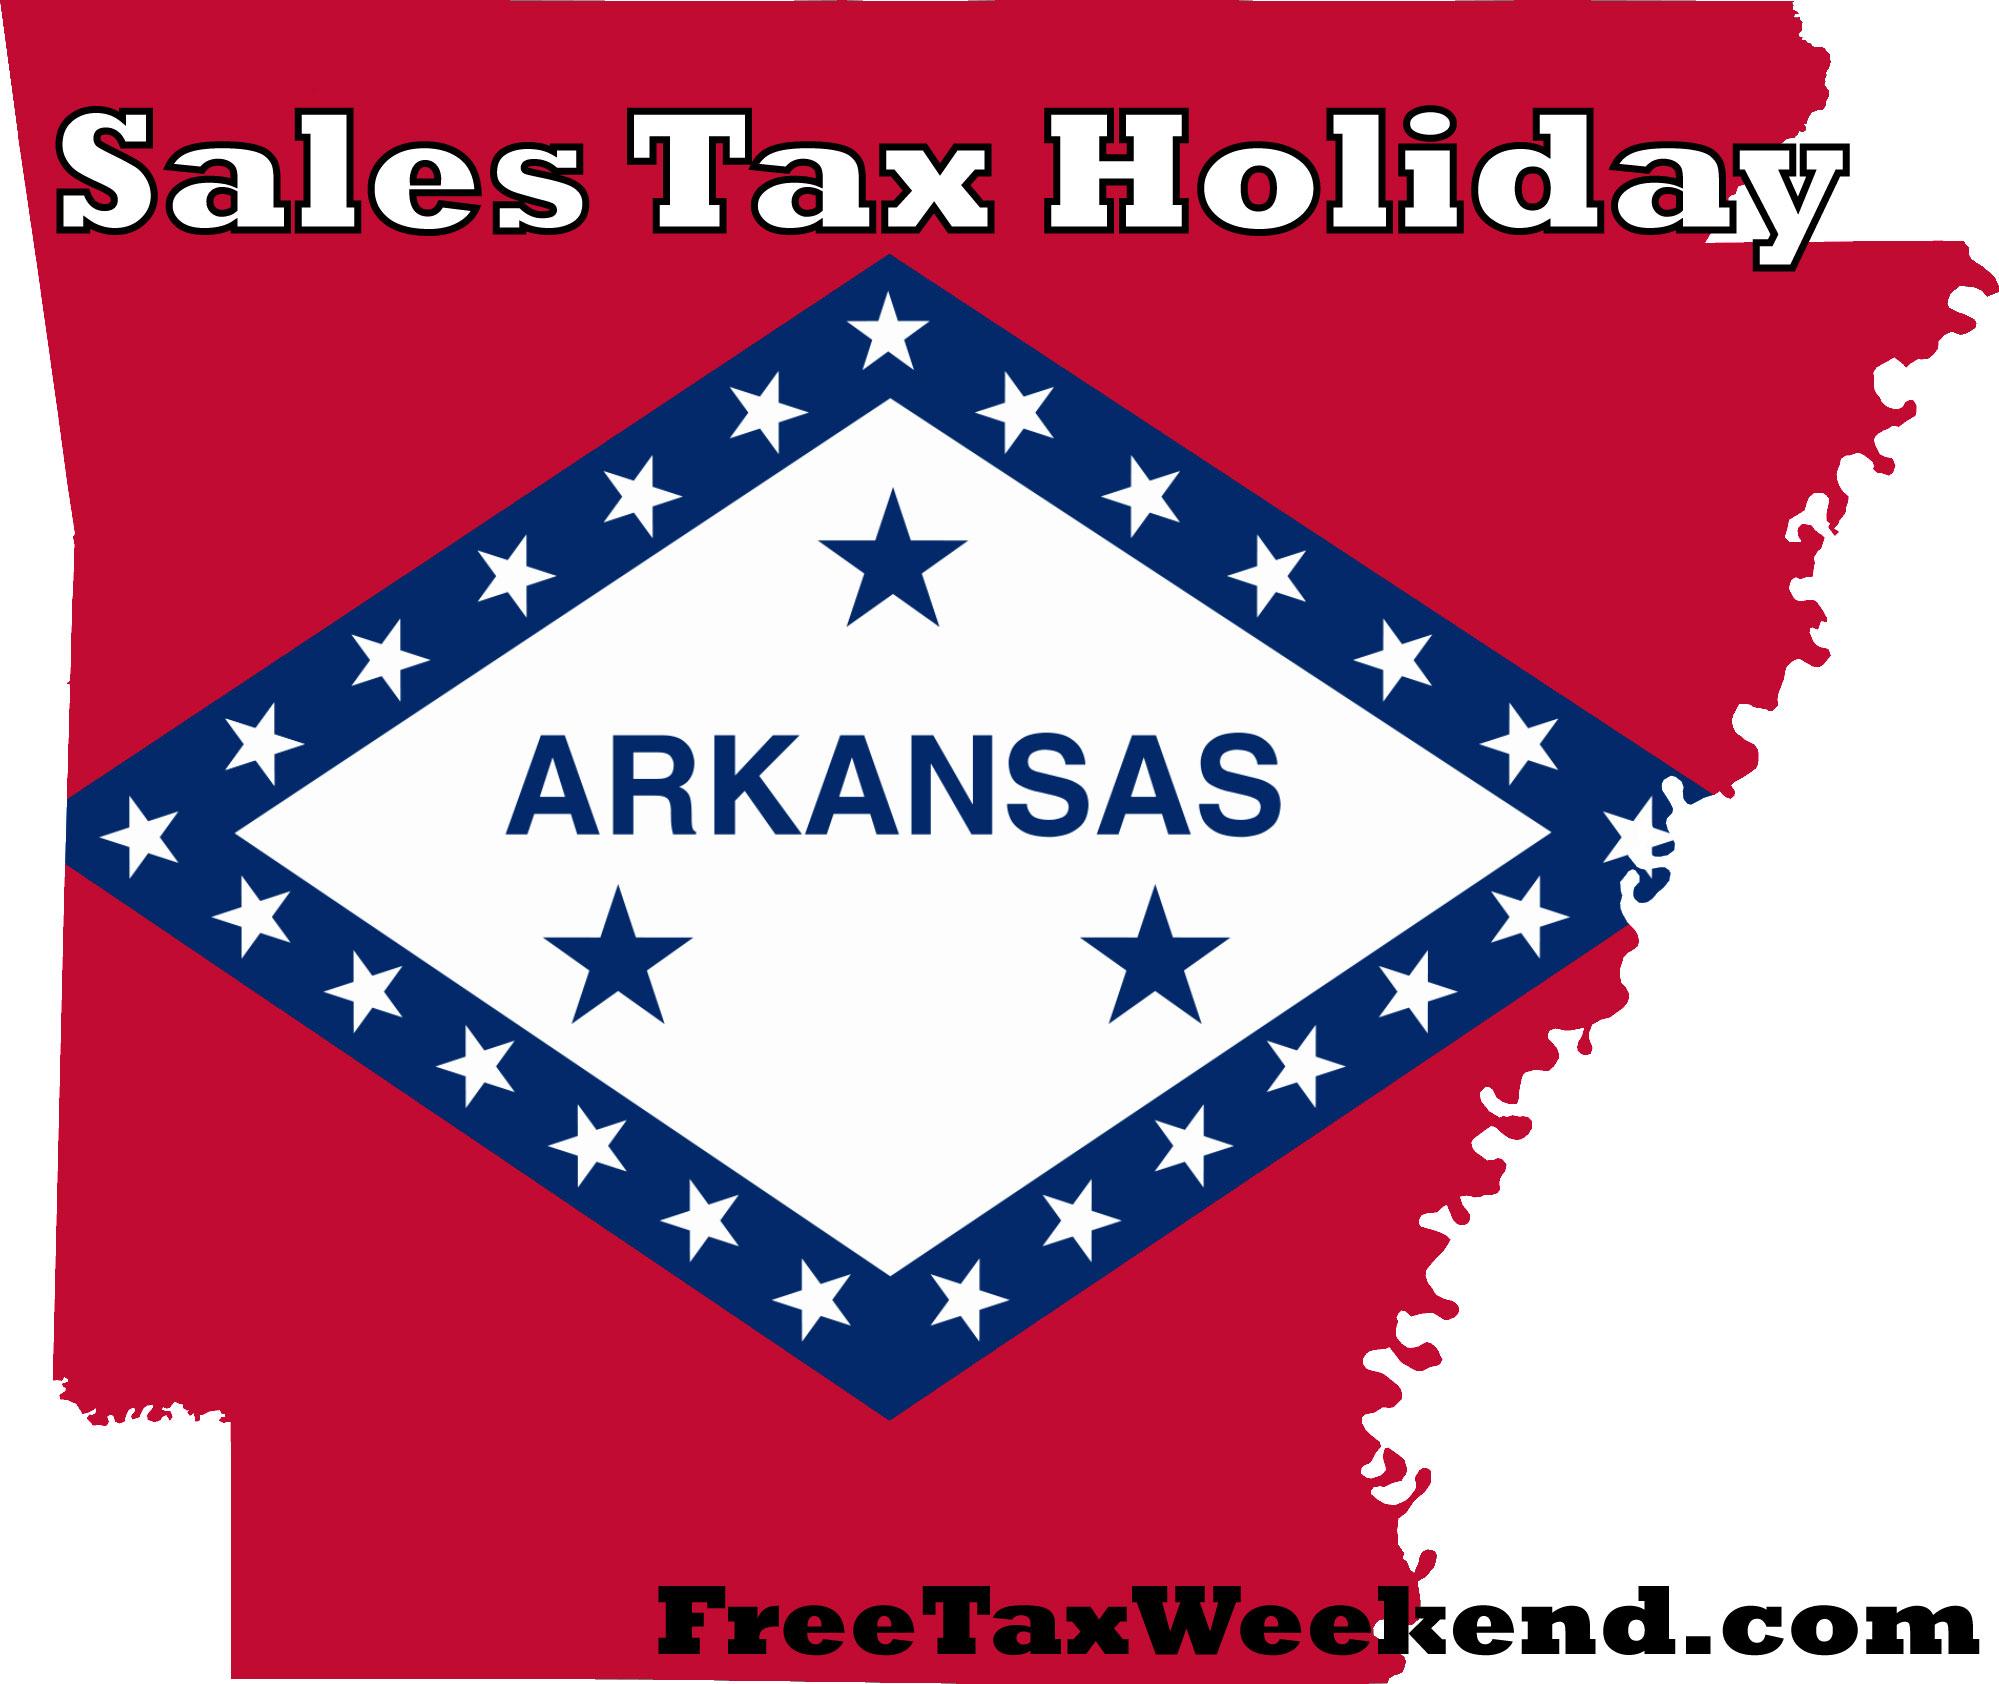 Arkansas Tax Free Weekend 2016